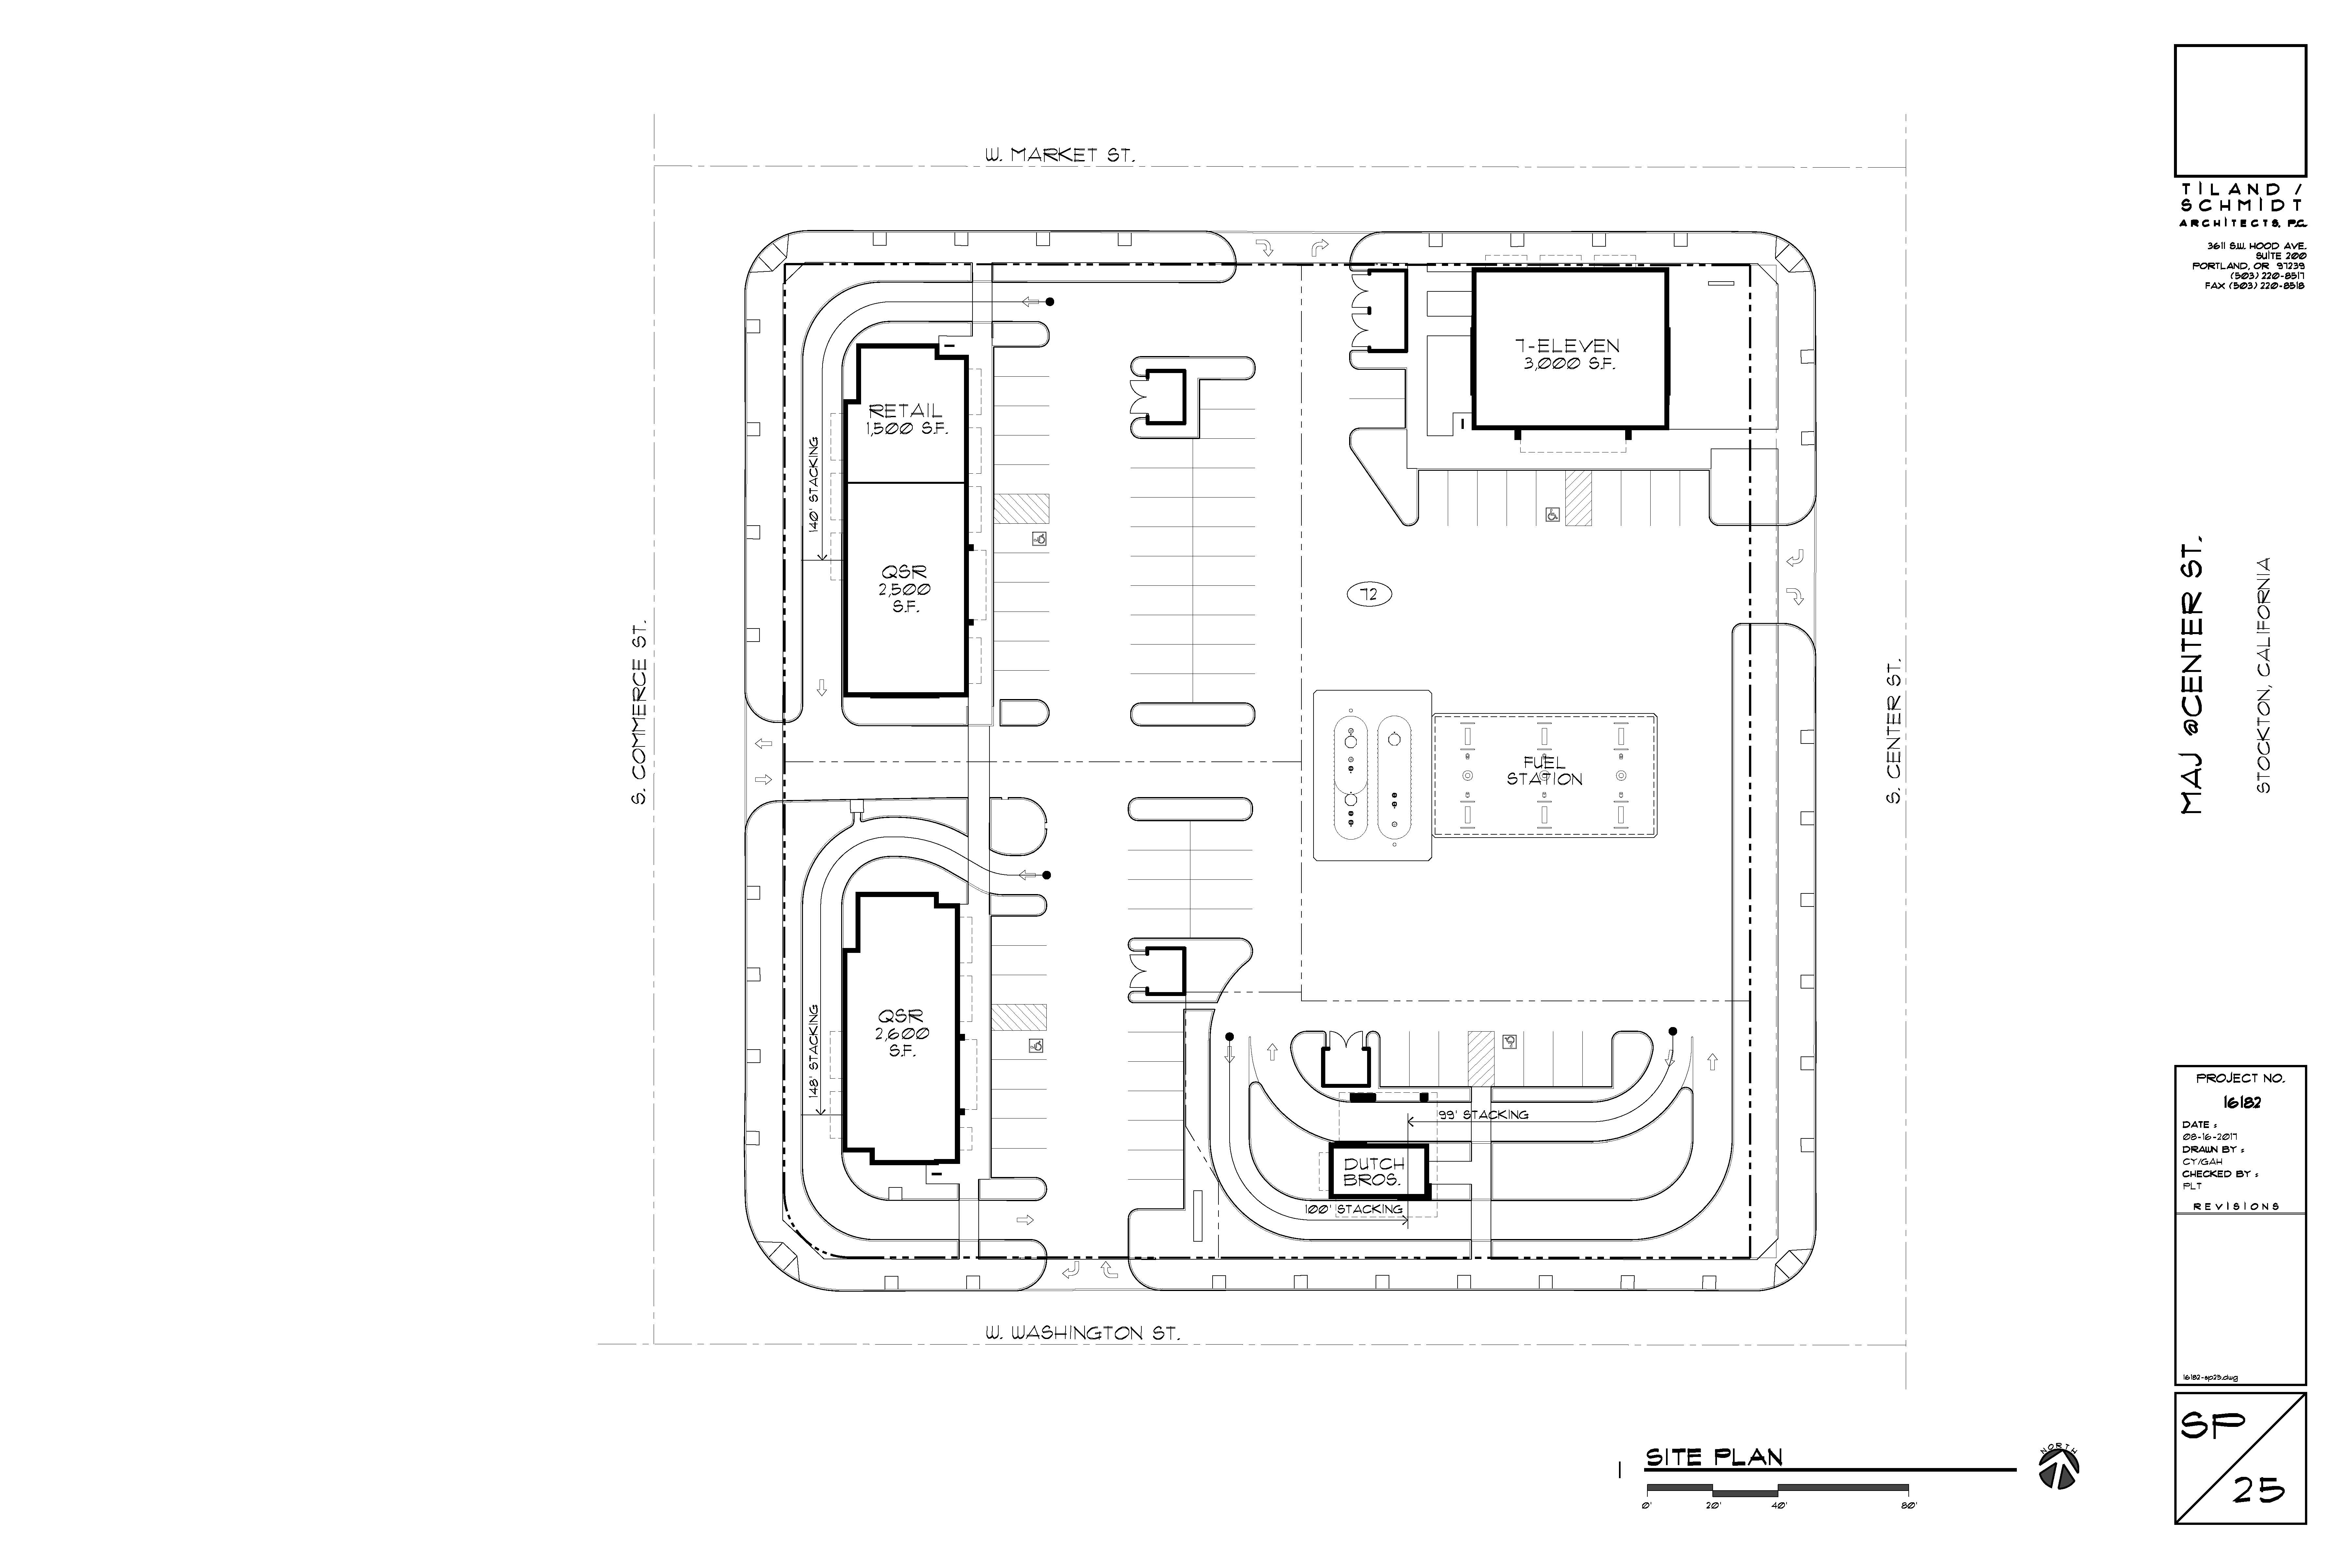 Siteplan-Stockton